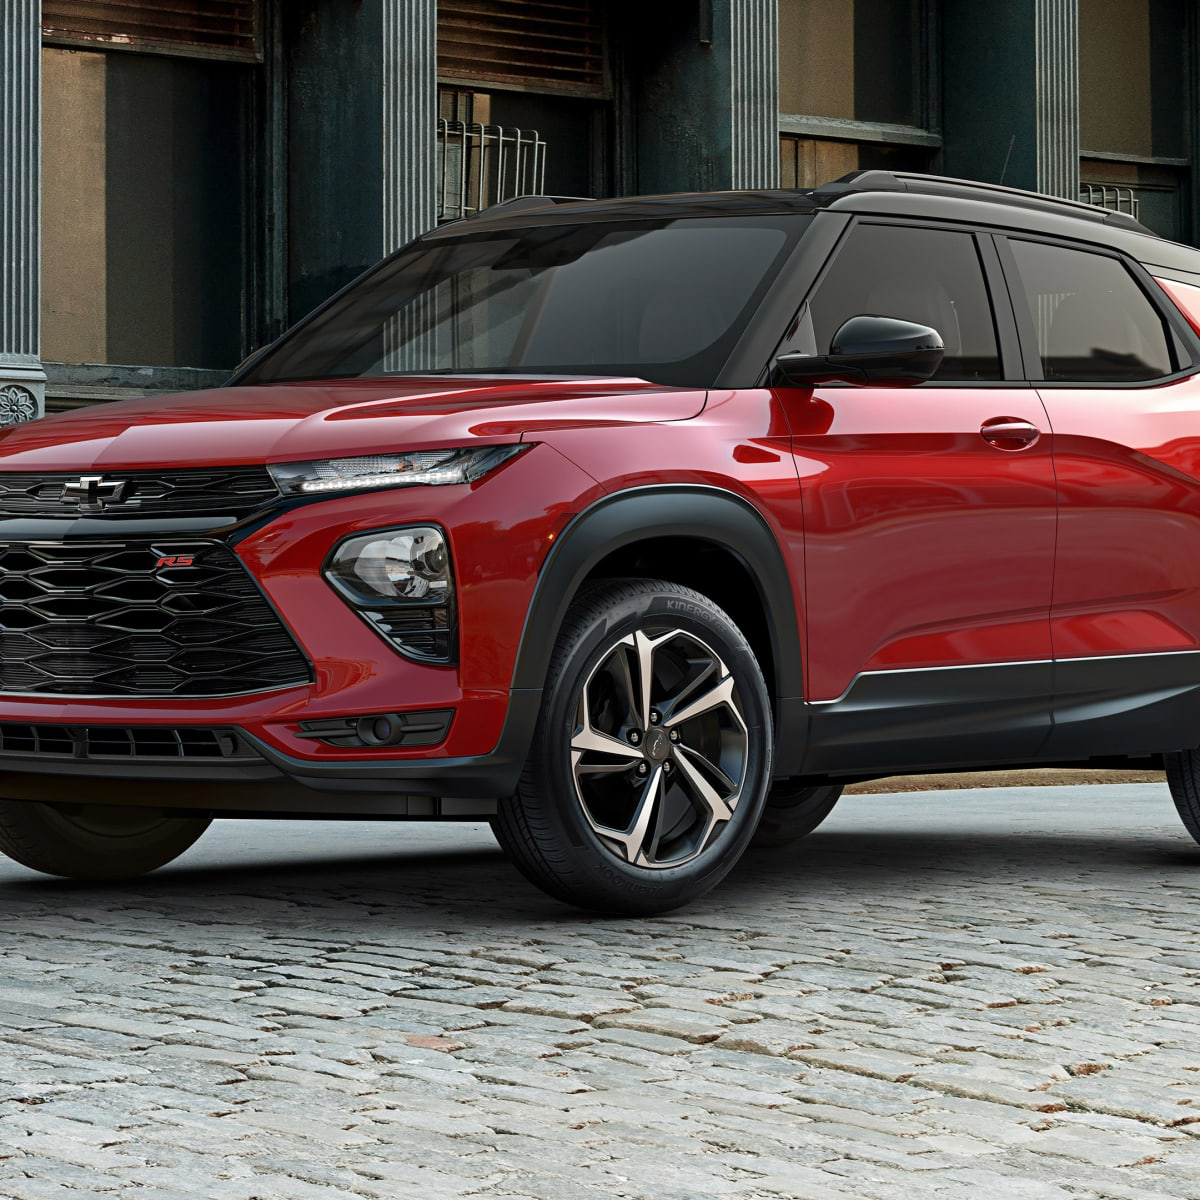 2020 Chevy Blazer: News, Design, Specs | Best Upcoming Car Release